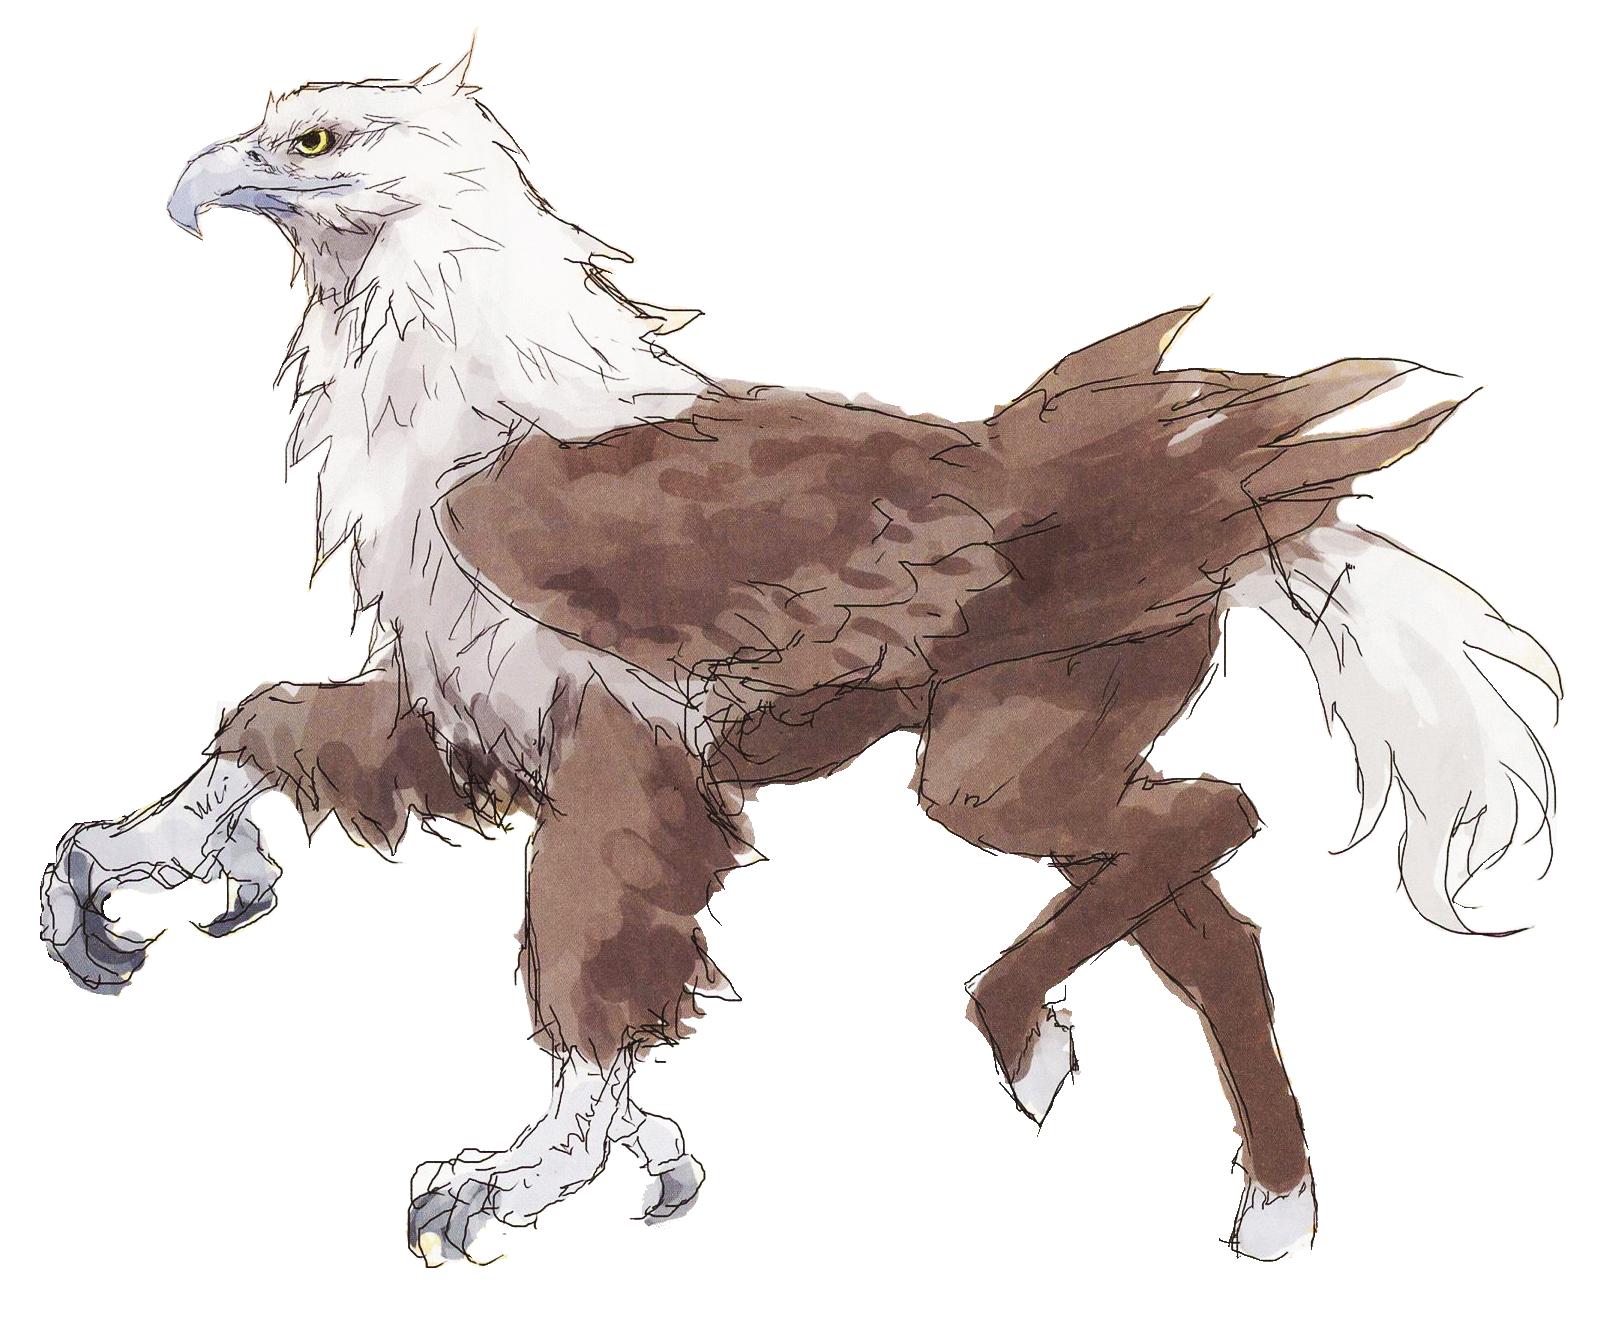 Hippogriff | TYPE-MOON Wiki | Fandom